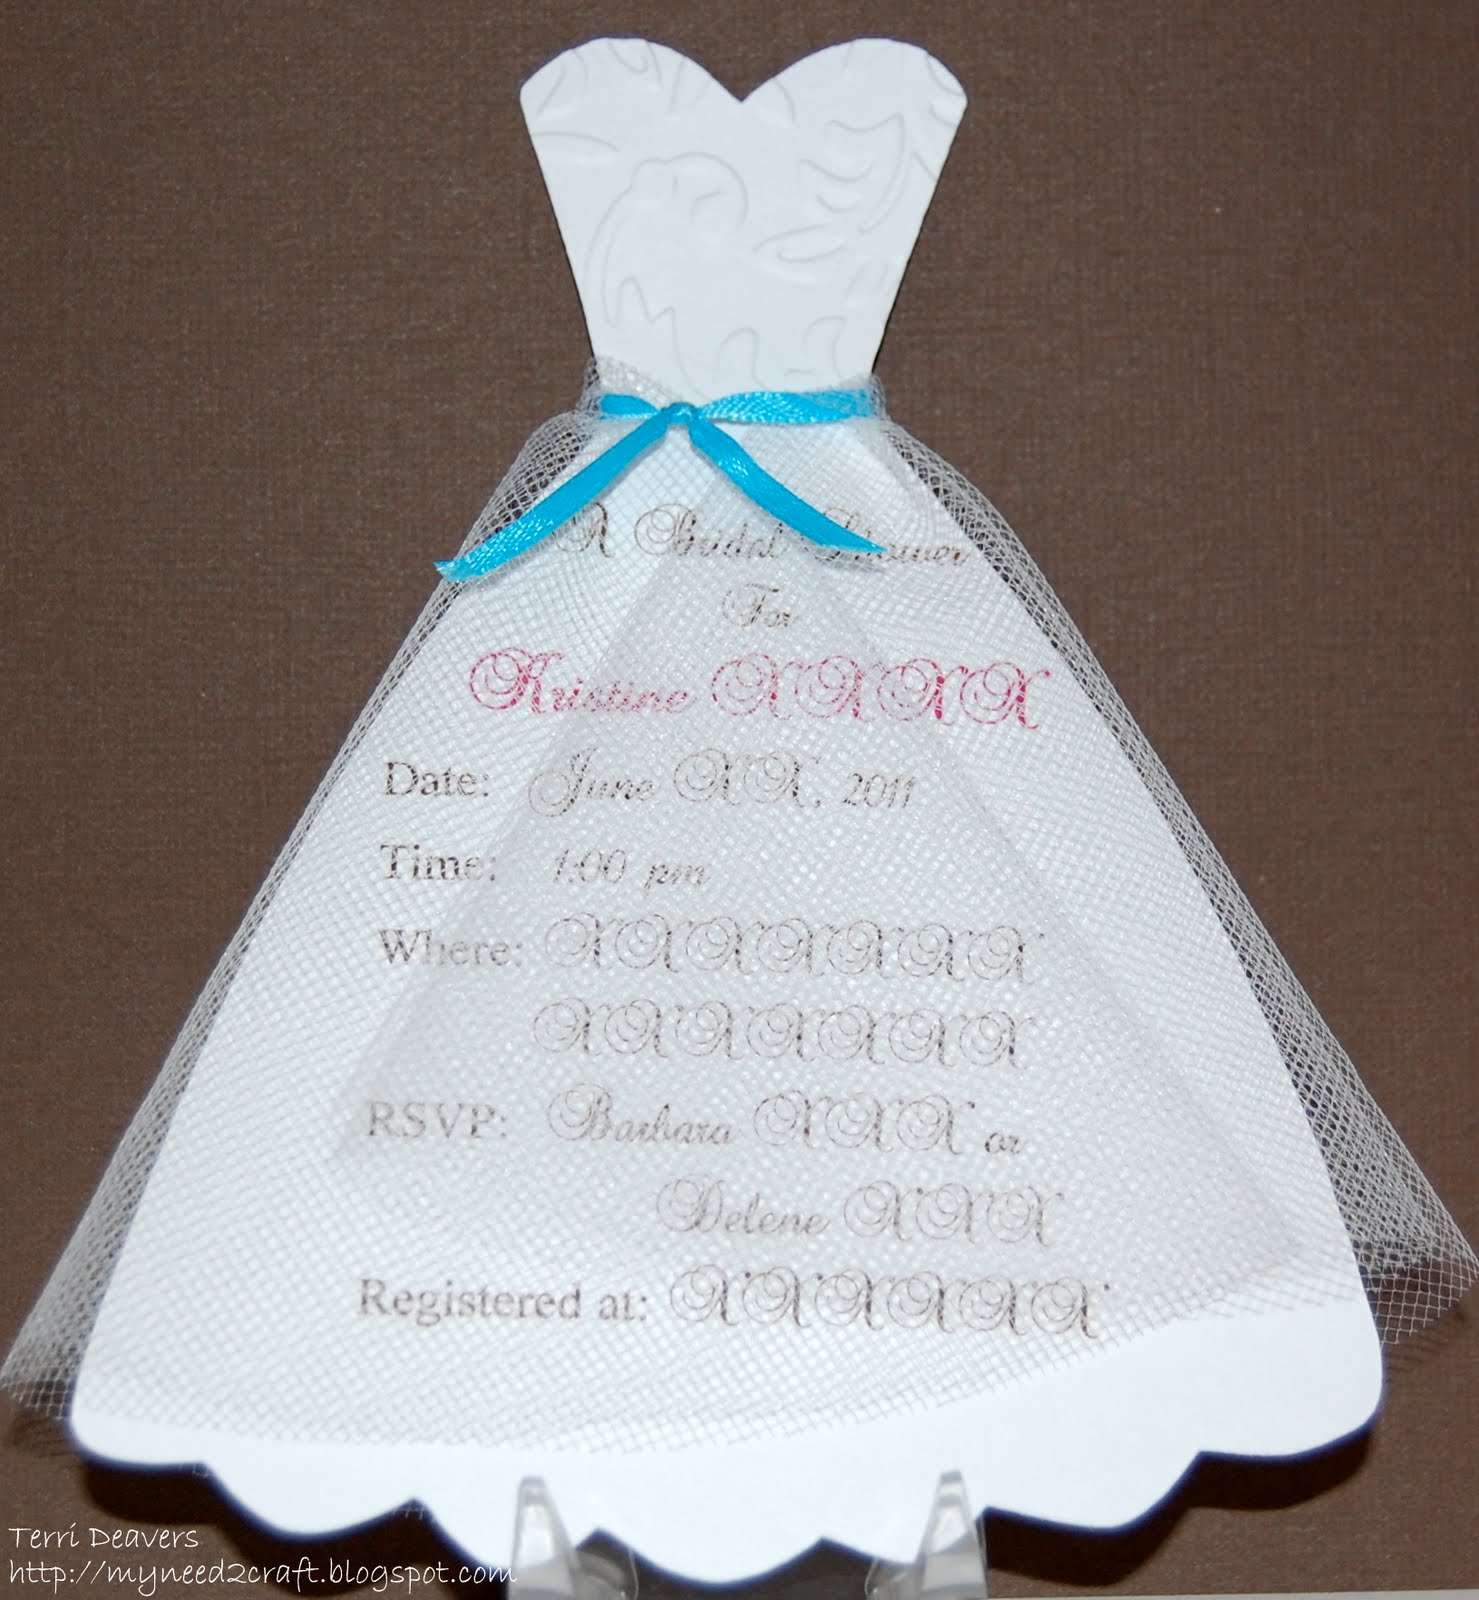 Homemade Bridal Shower Invitations Templates